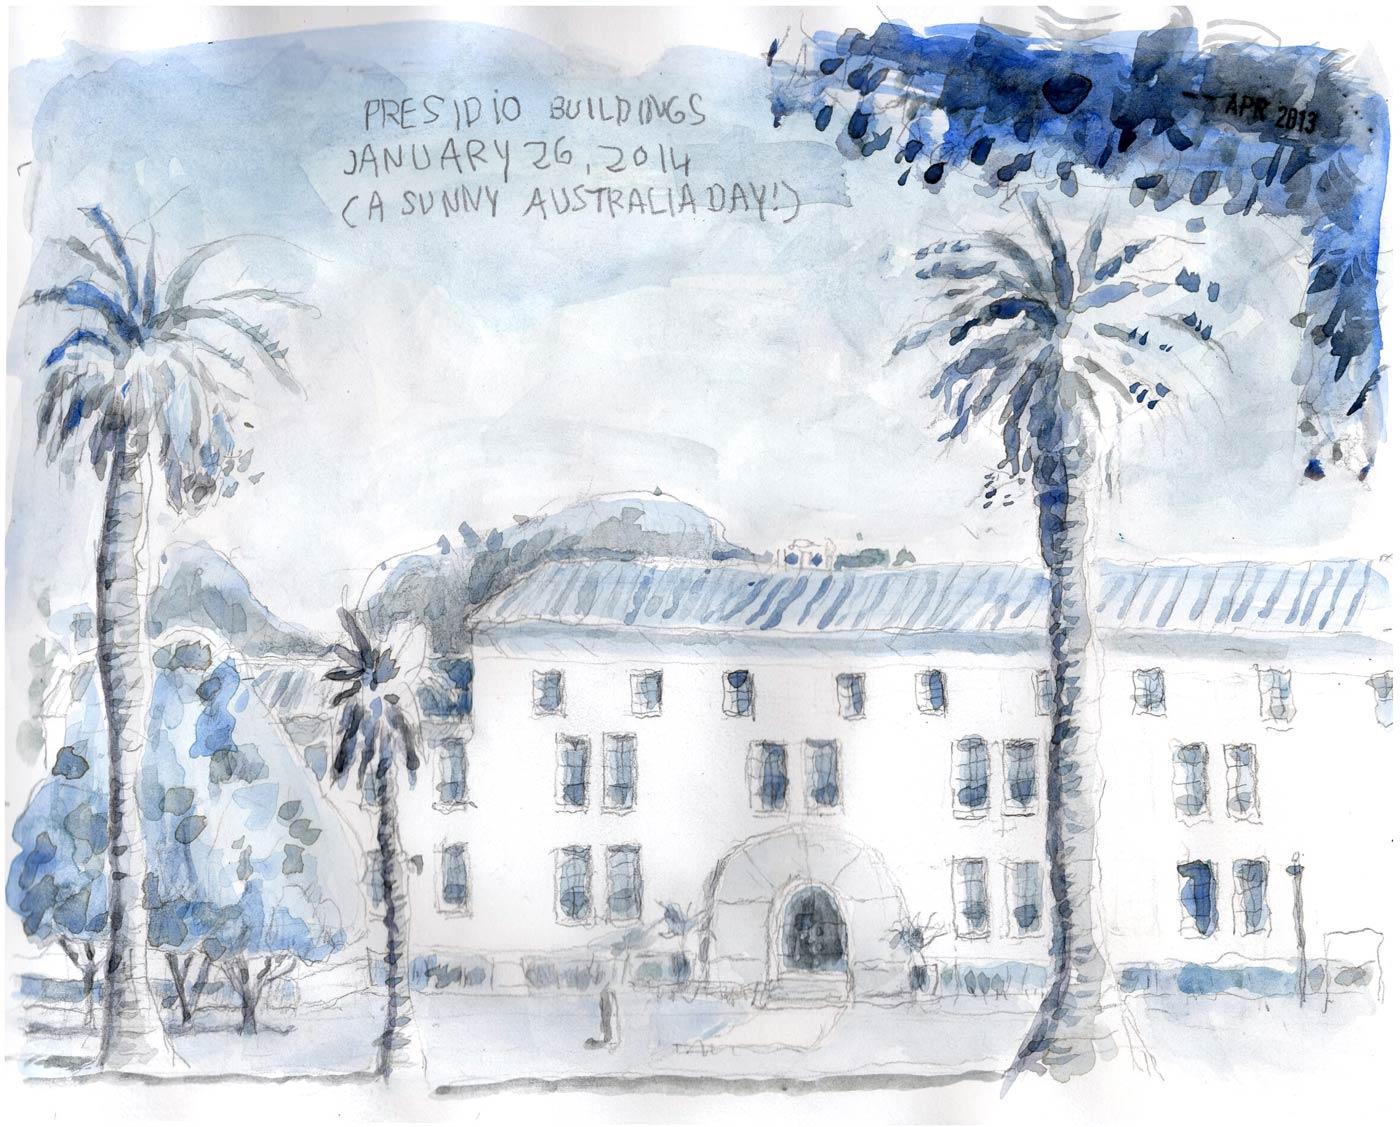 presidio_buildings